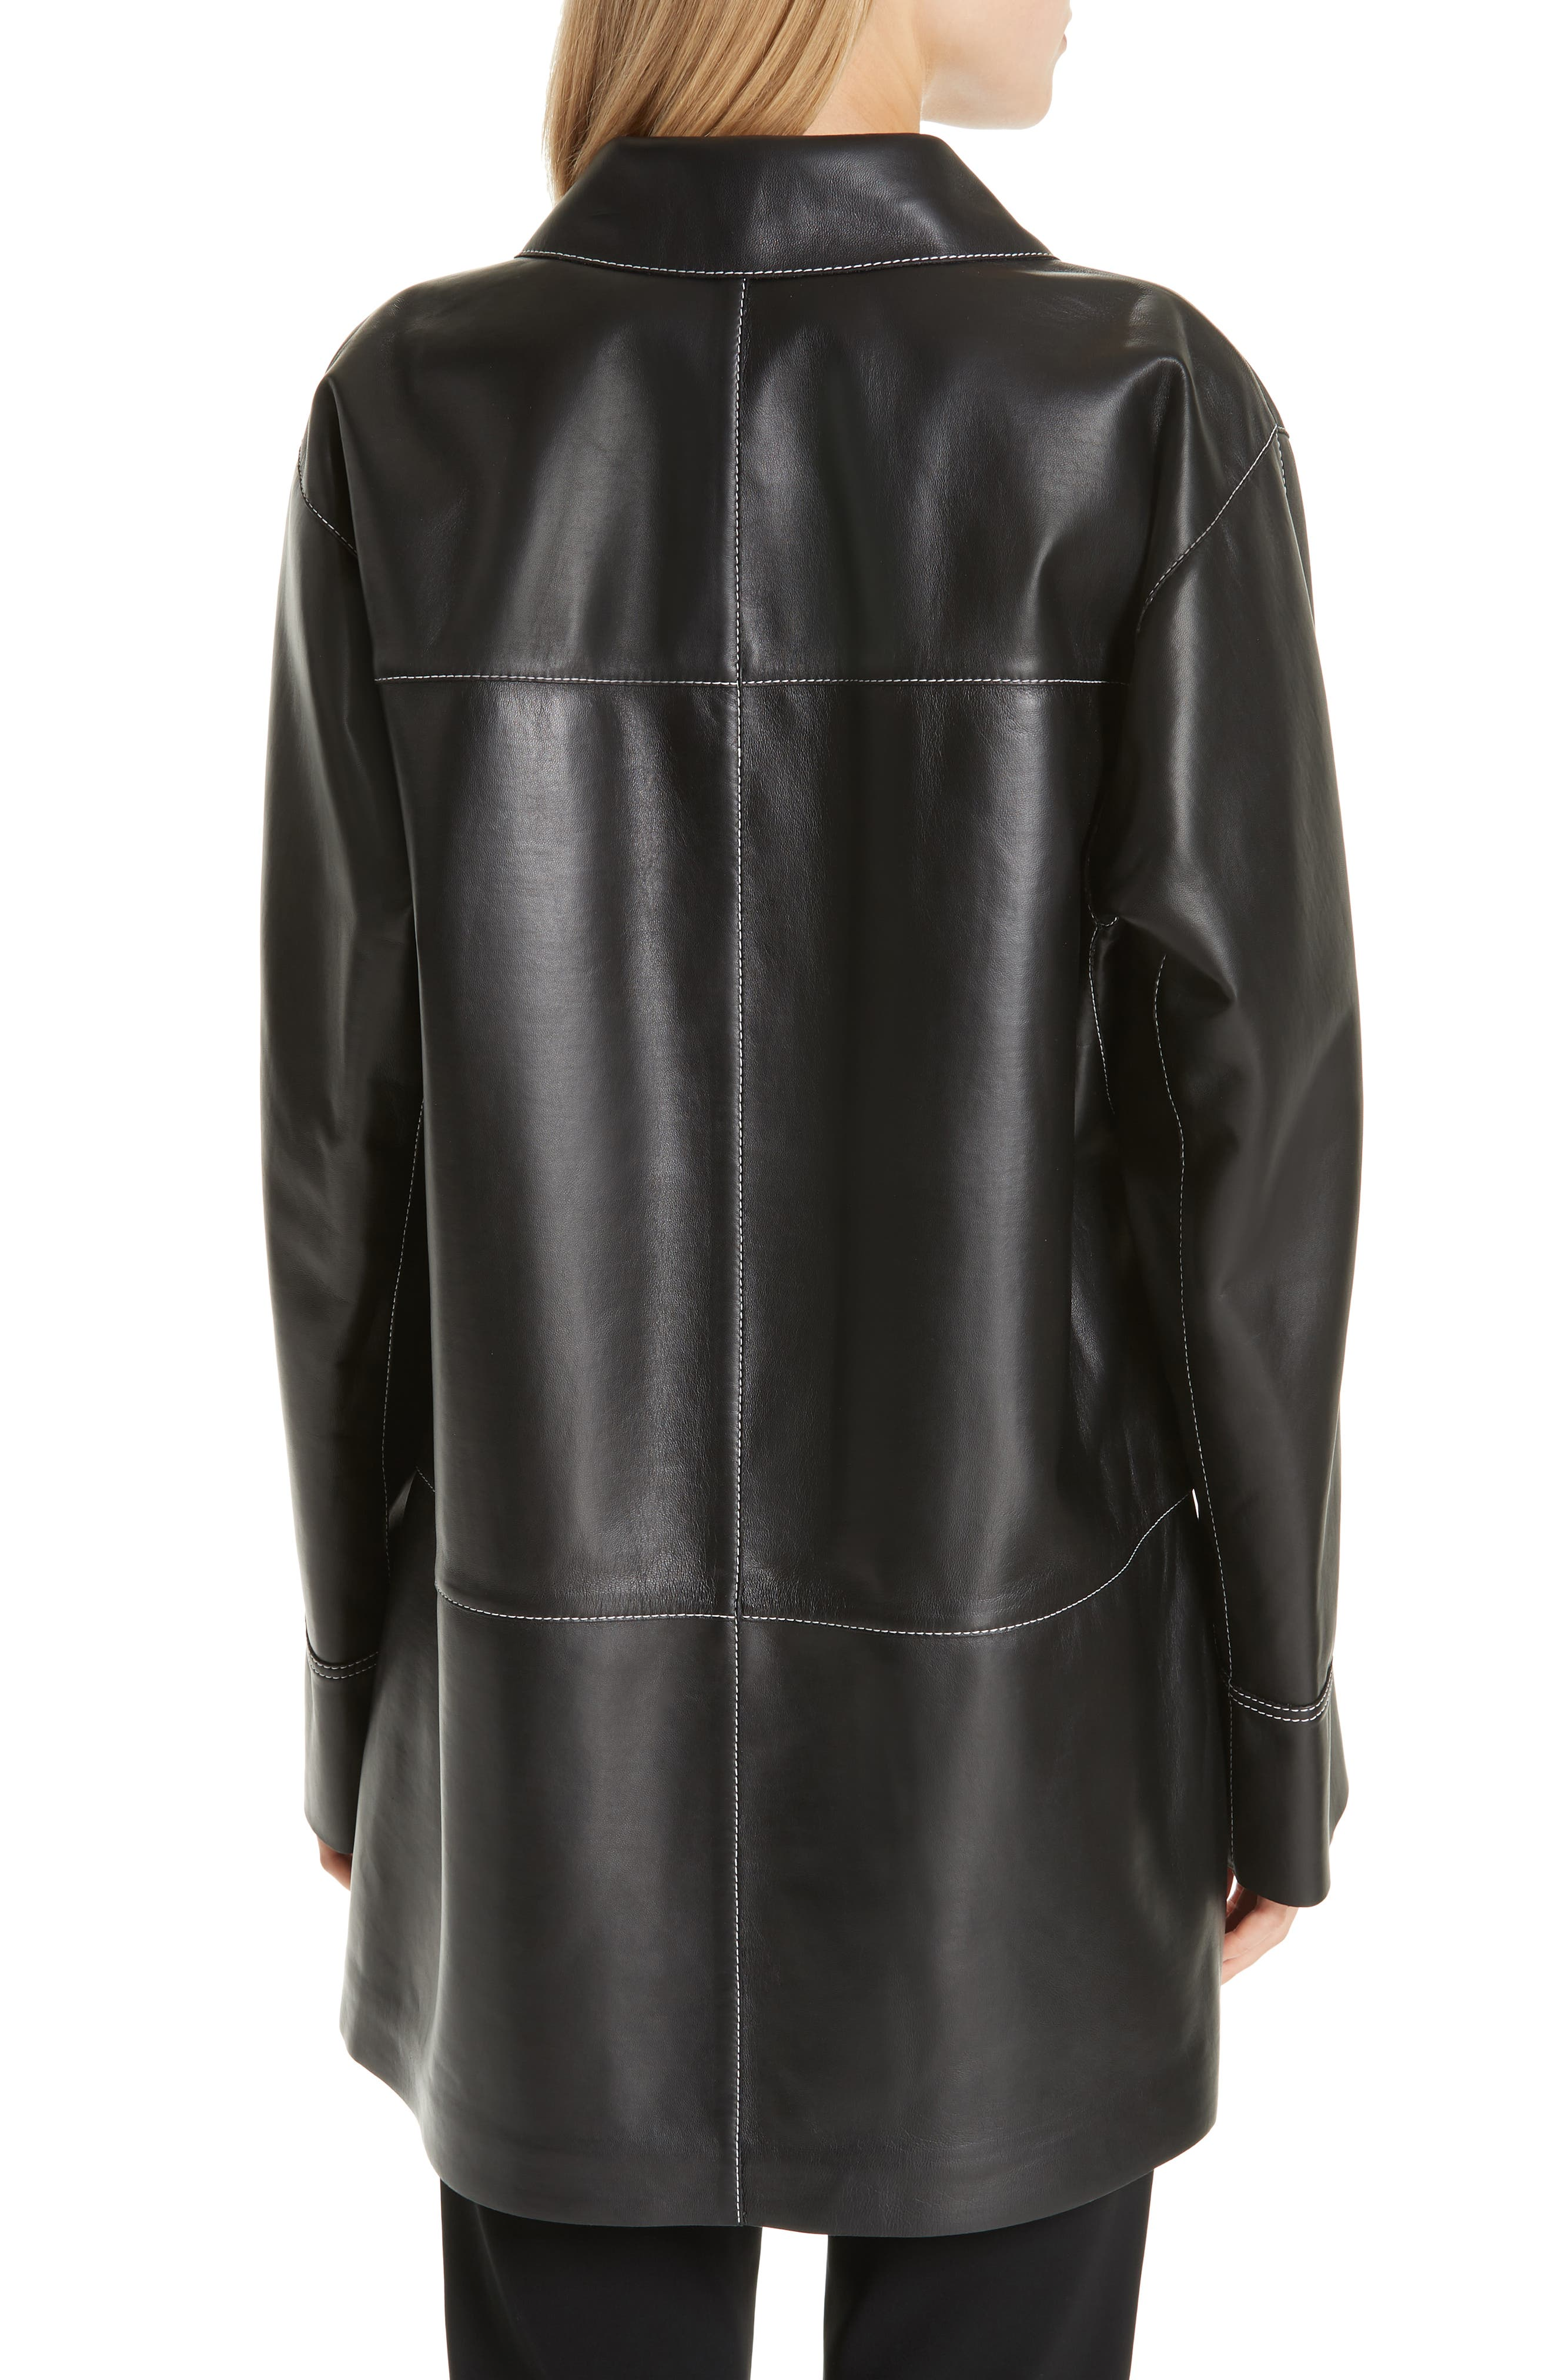 Christopher Leather Jacket,                             Alternate thumbnail 2, color,                             BLACK